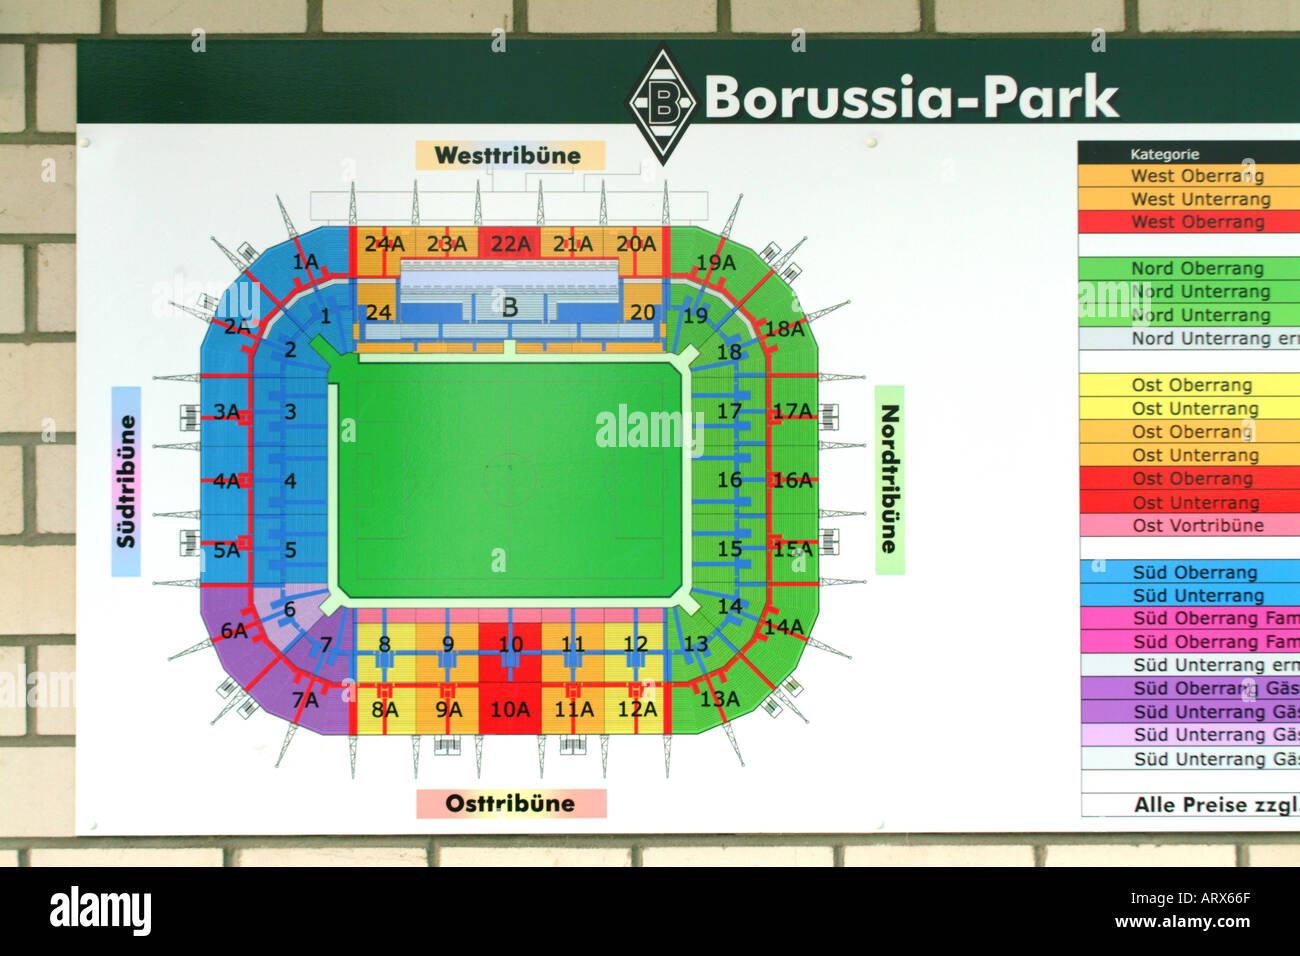 Borussia Mönchengladbach - Stock Image